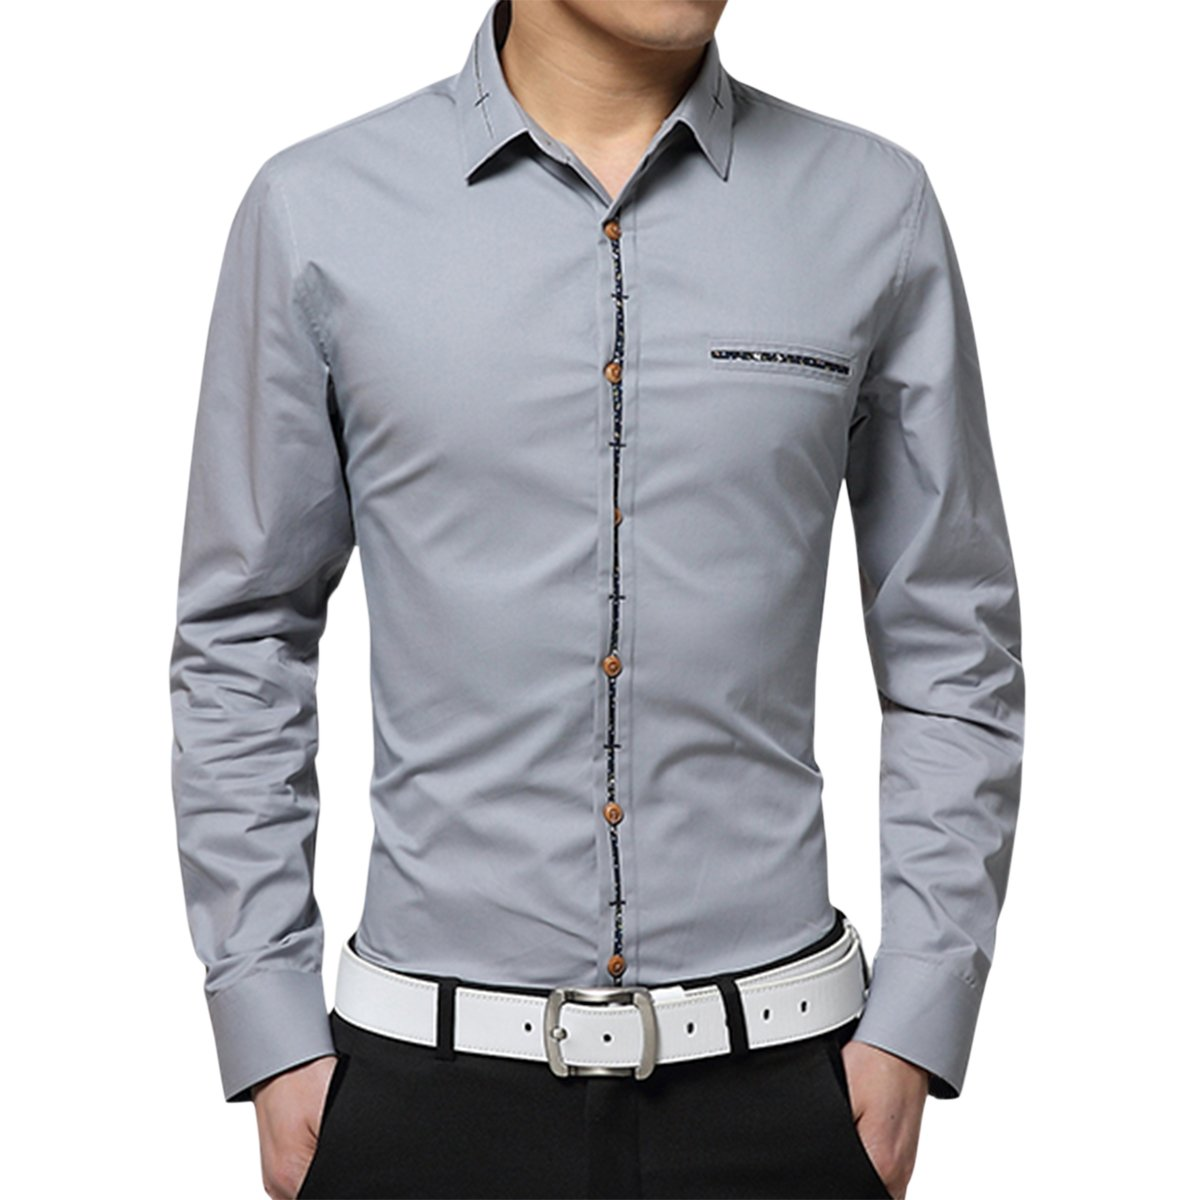 Pishon Mens Button Up Shirt Slim Fit Long Sleeve Business Contrast Dress Shirt